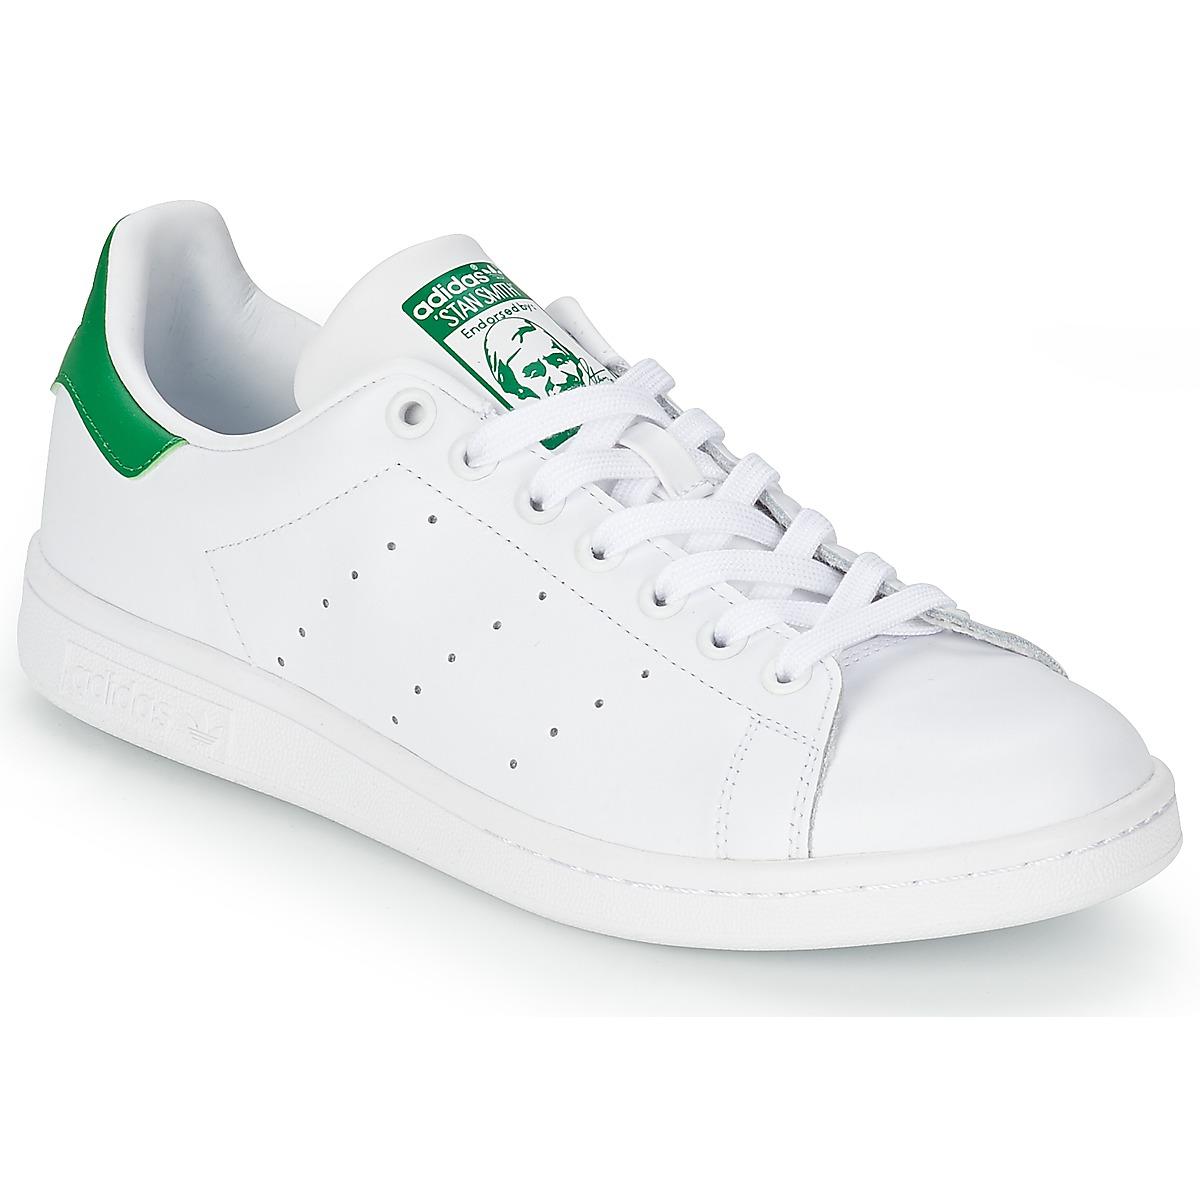 Nizke tenisky adidas Originals STAN SMITH Bílá / Zelená